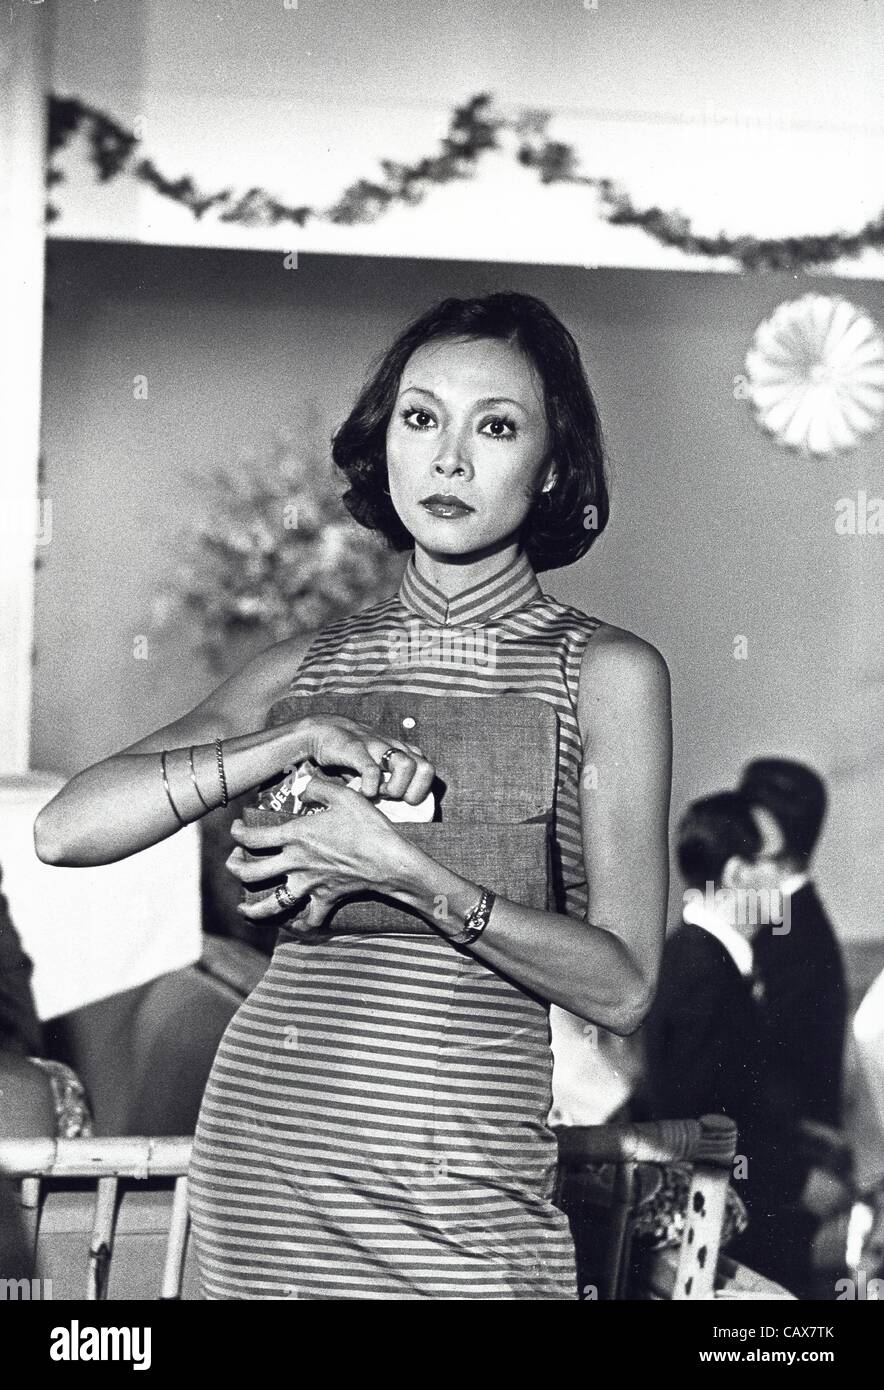 Setsuko Hara images